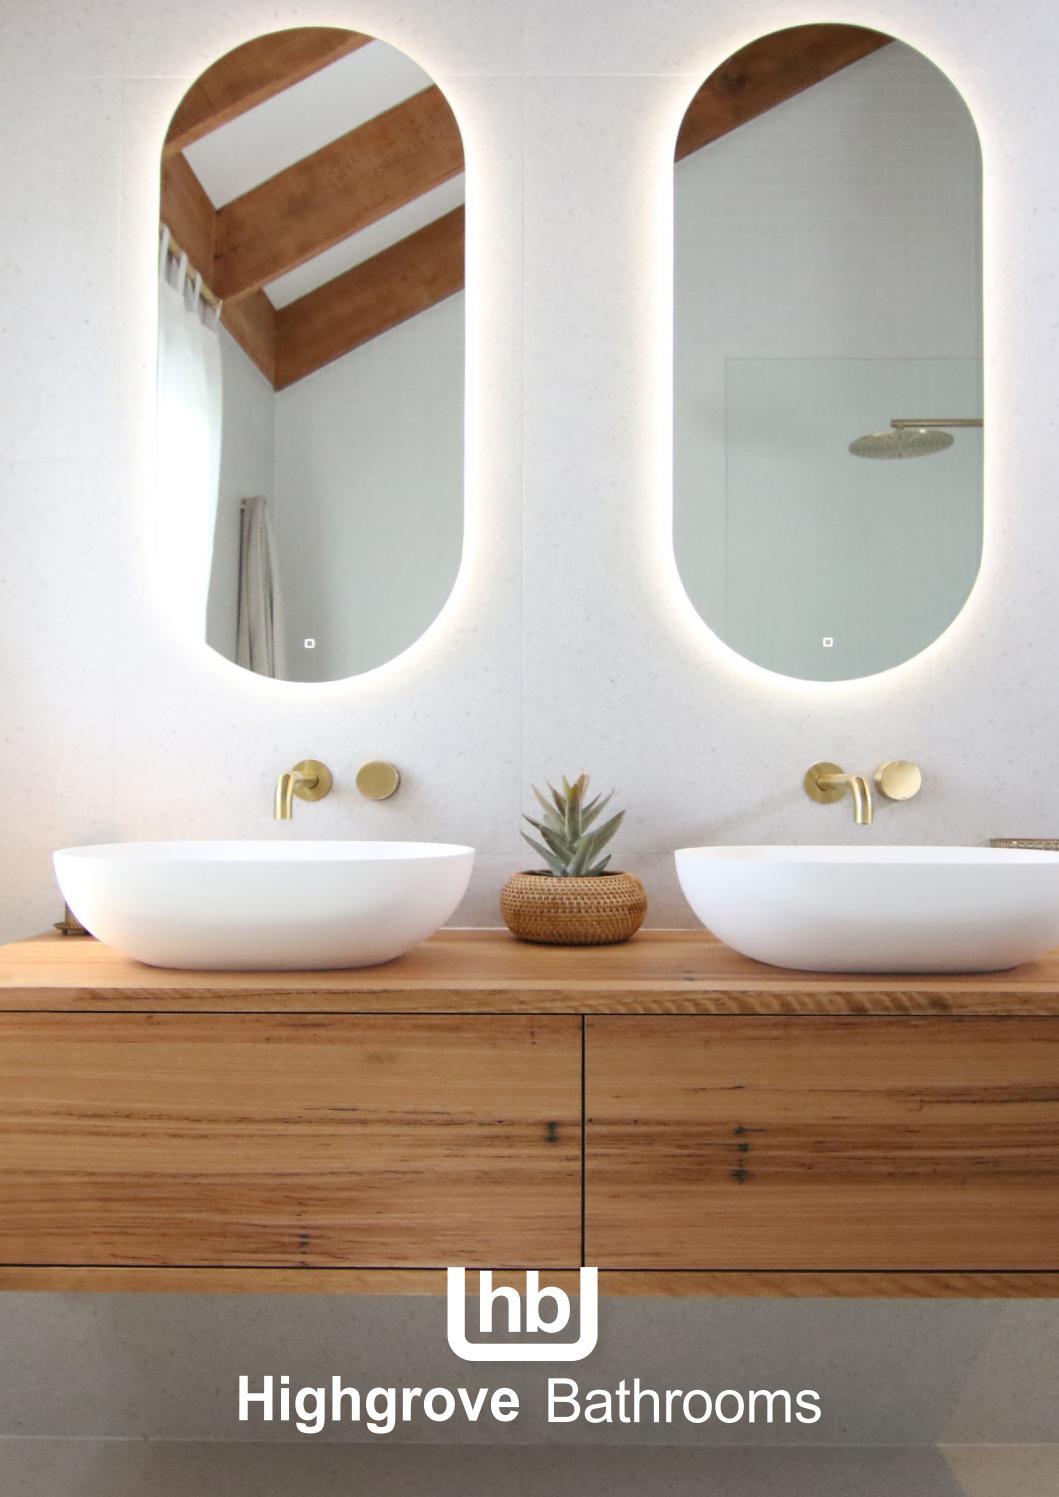 Bathroom Round Single Towel Rail 750mm Wall Mounted Brass Chrome